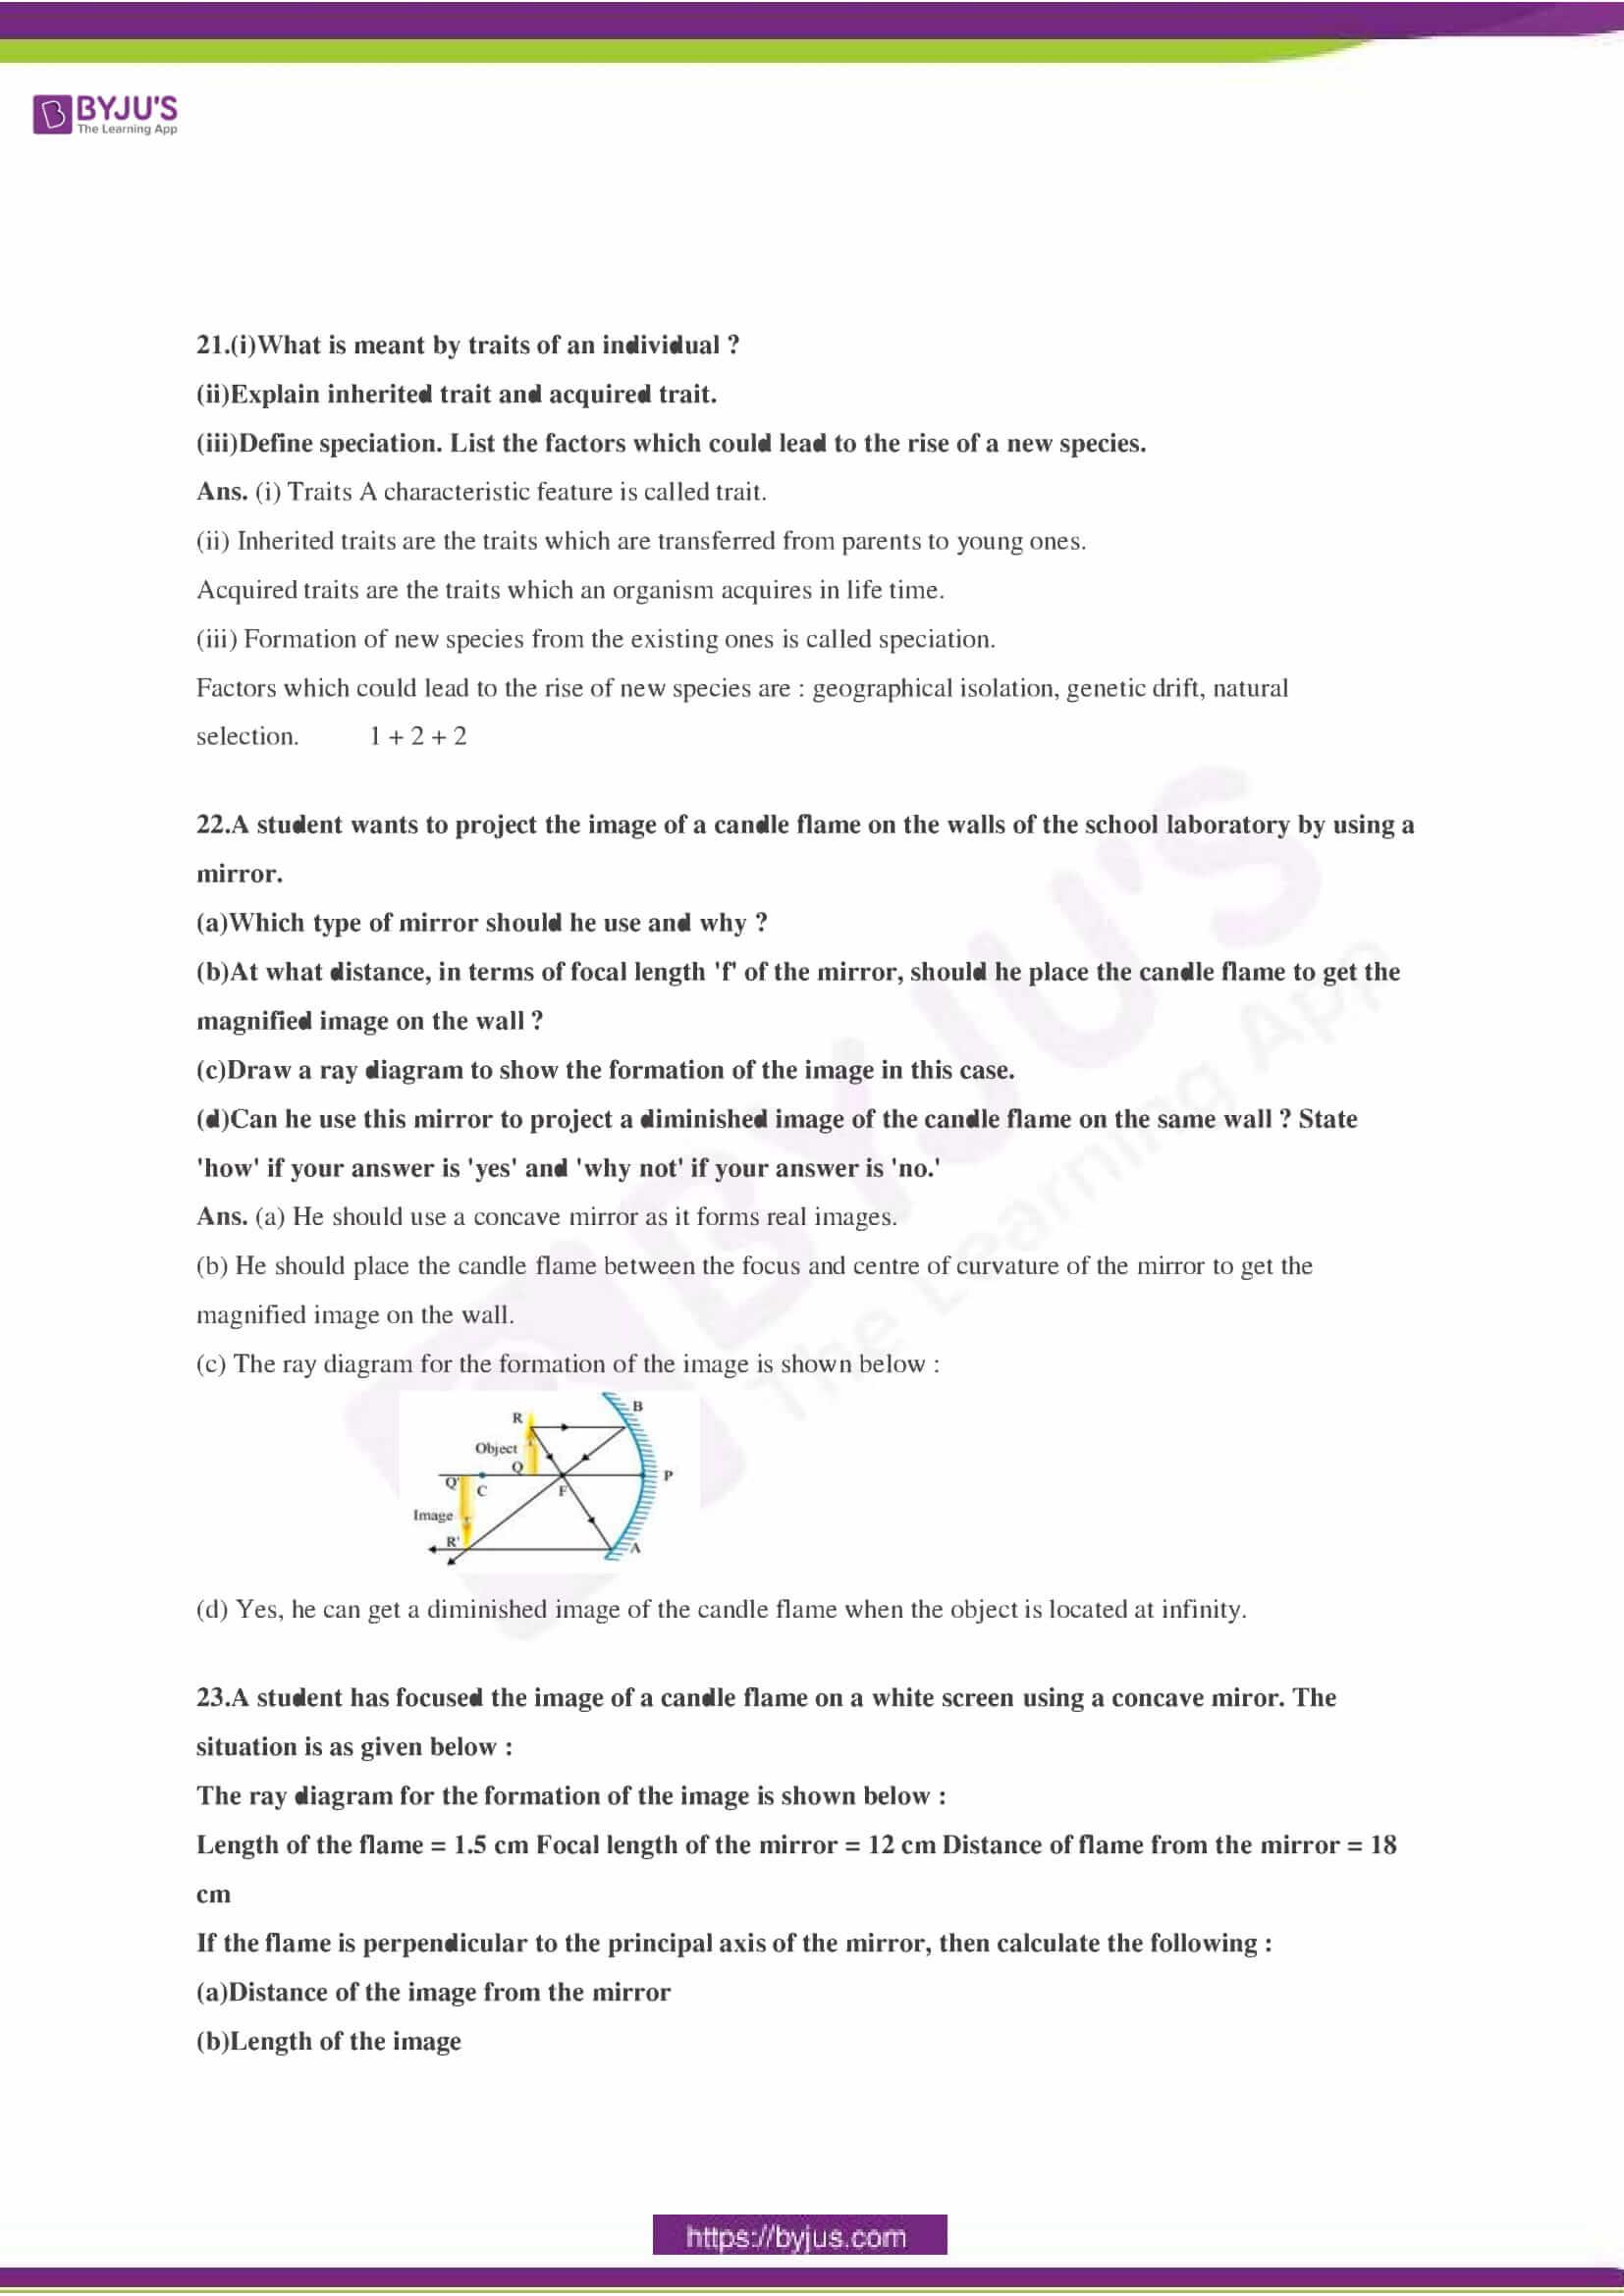 CBSE Class 10 Science Sample Paper Solution Set 3-07